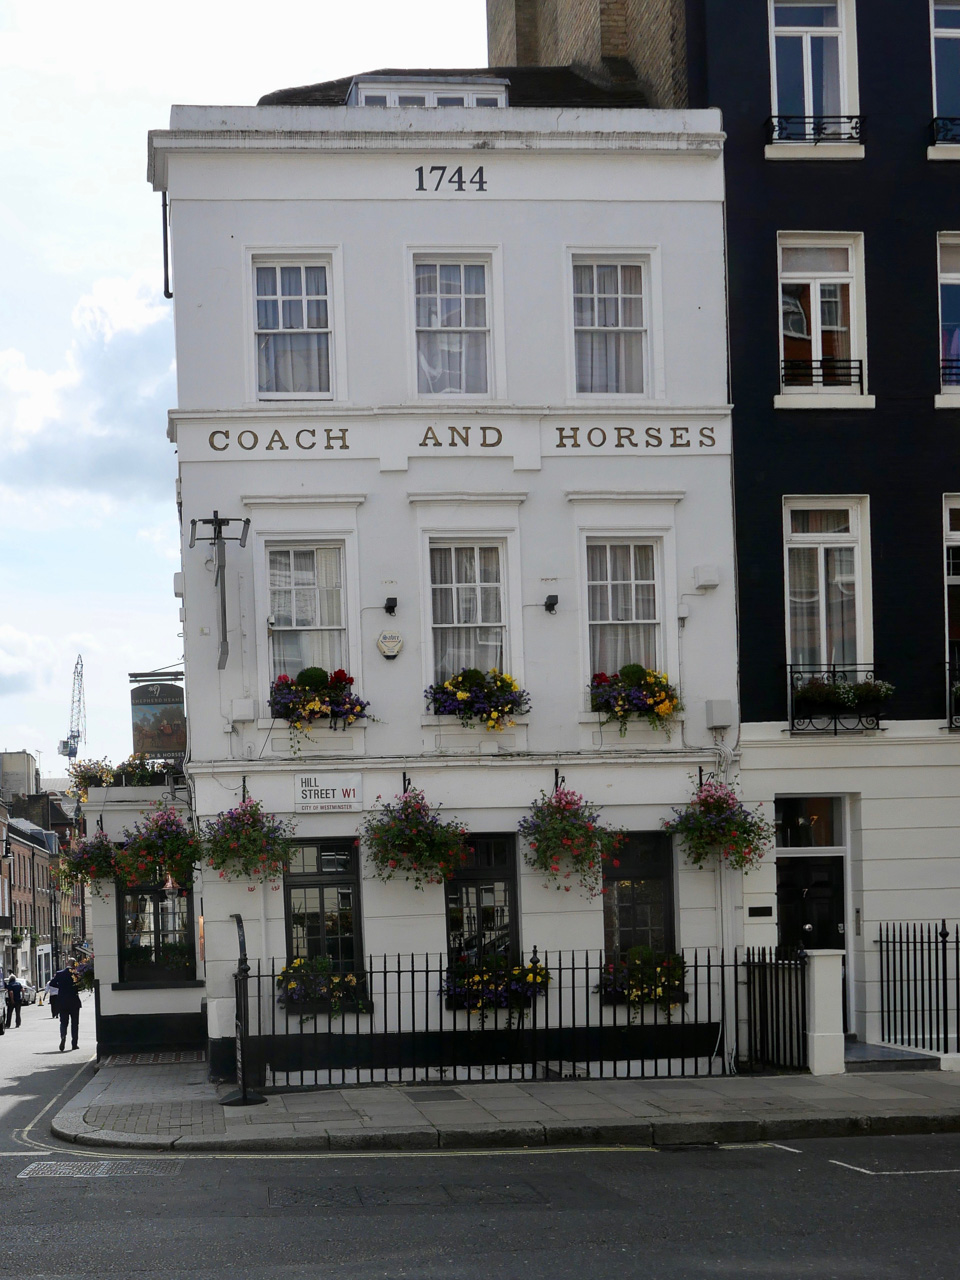 Cara Sharratt Travel - Coach and Horses in Mayfair - London, England